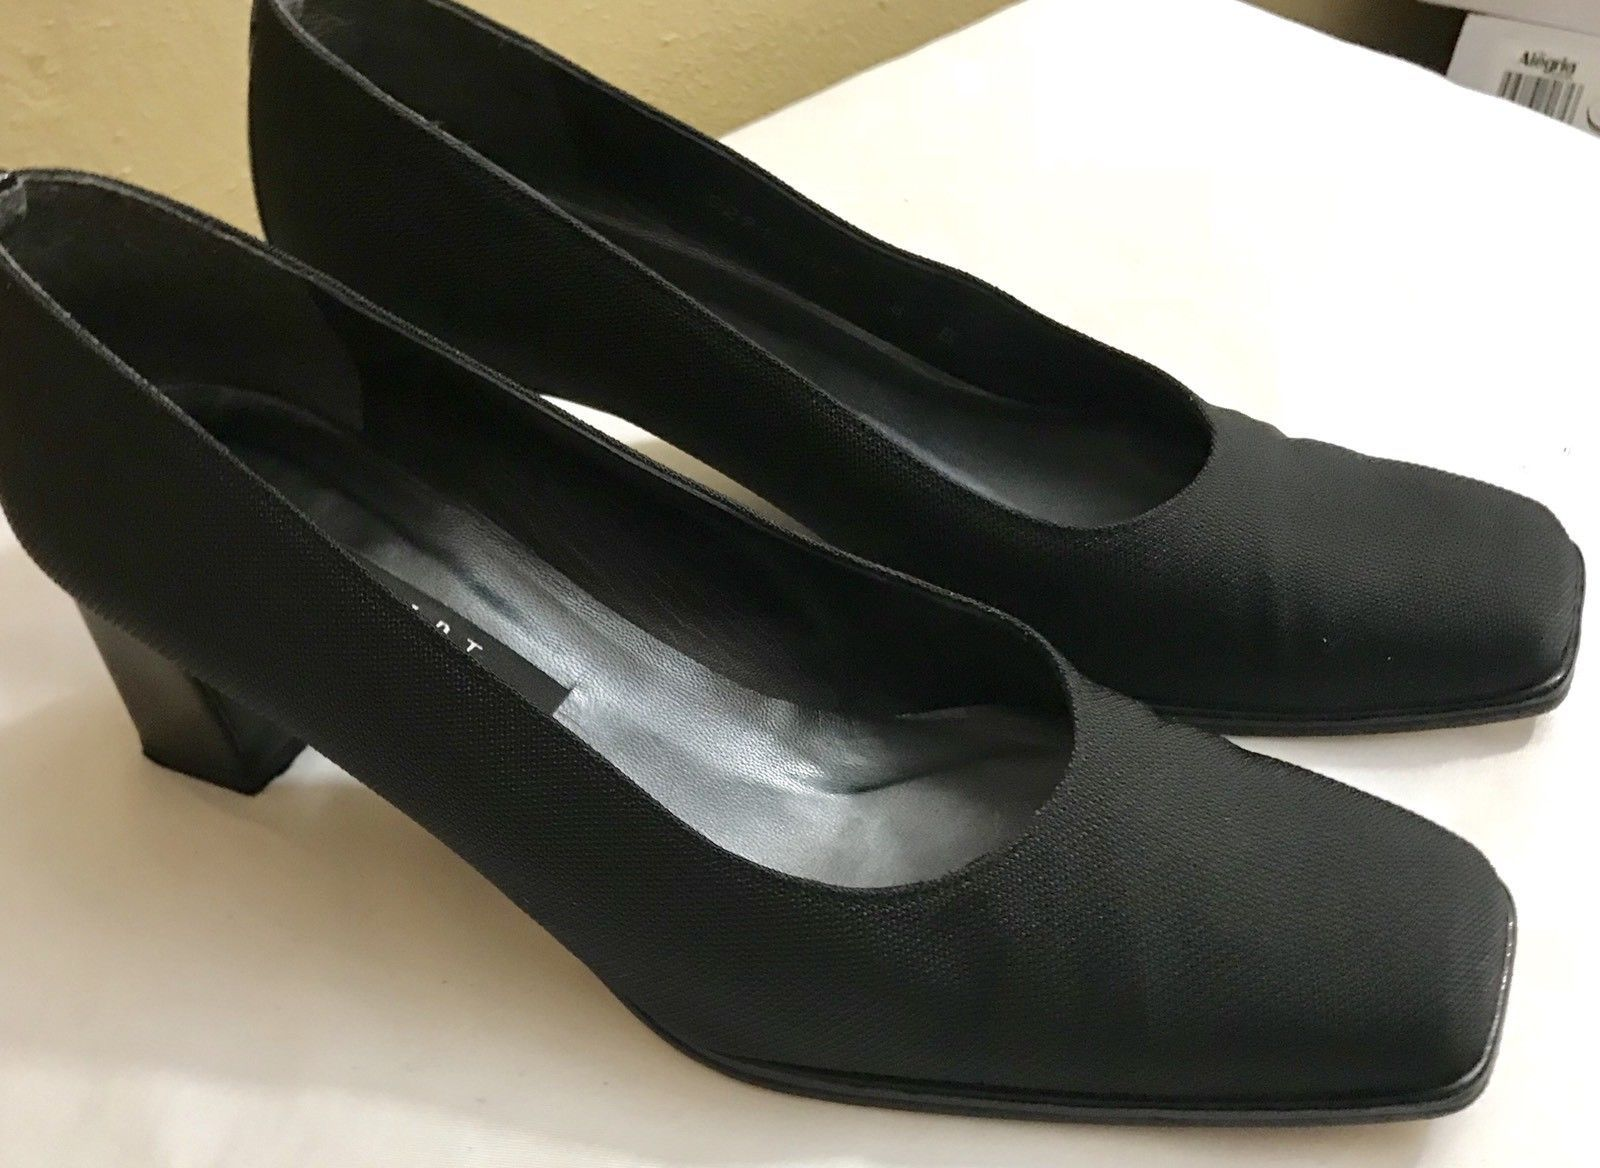 d3f148c39c46 S l1600. S l1600. Previous. Stuart Weitzman Square Toe Fabric Patent Leather  Women s Heels Size 8 Medium